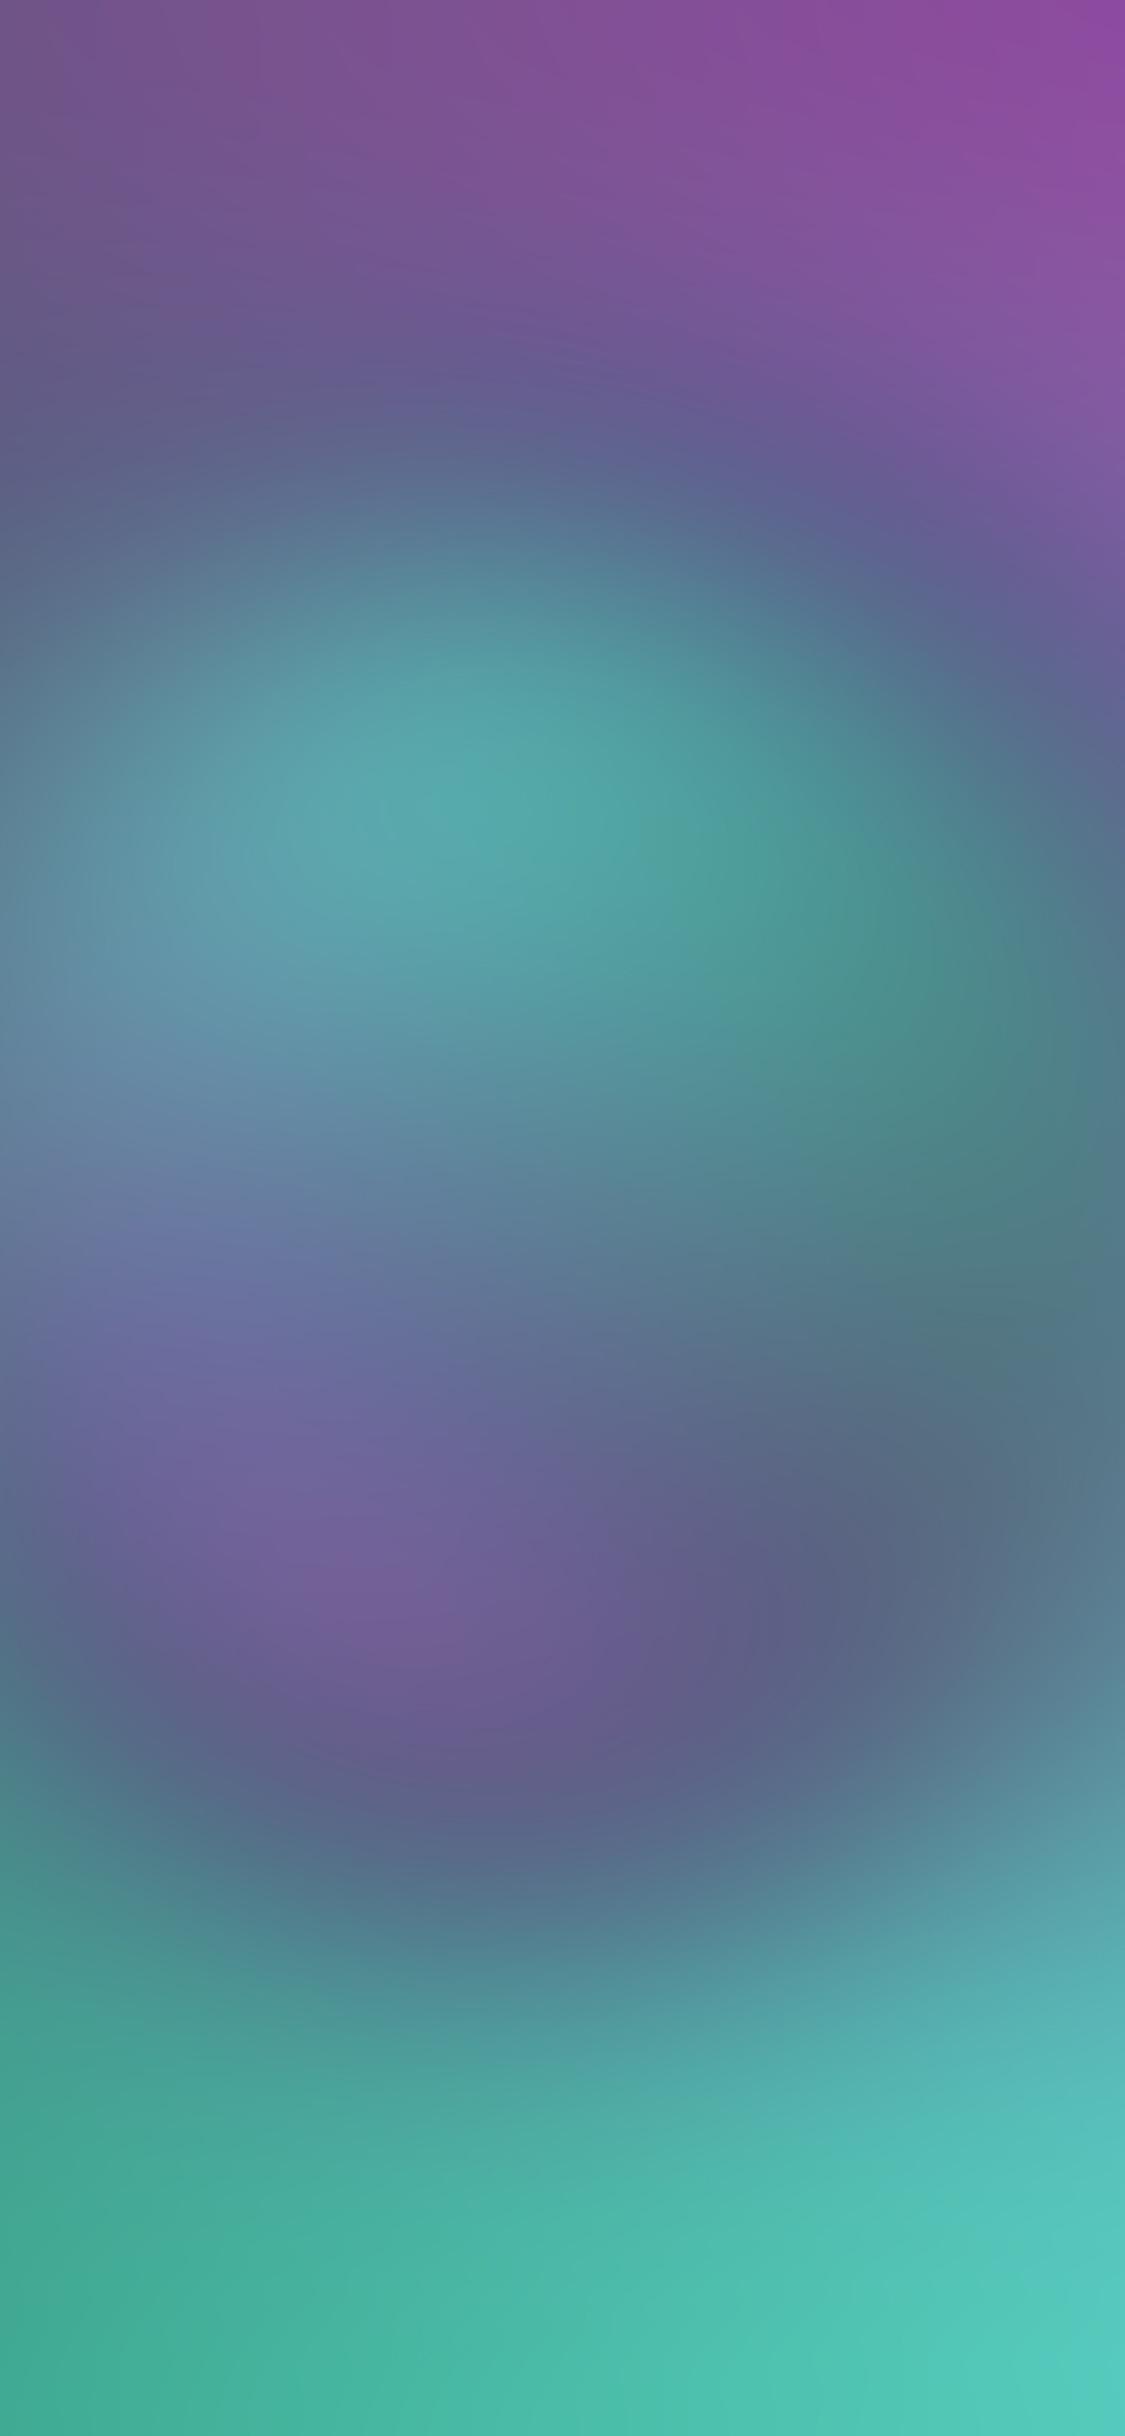 iPhoneXpapers.com-Apple-iPhone-wallpaper-sk70-soft-purple-green-blur-gradation